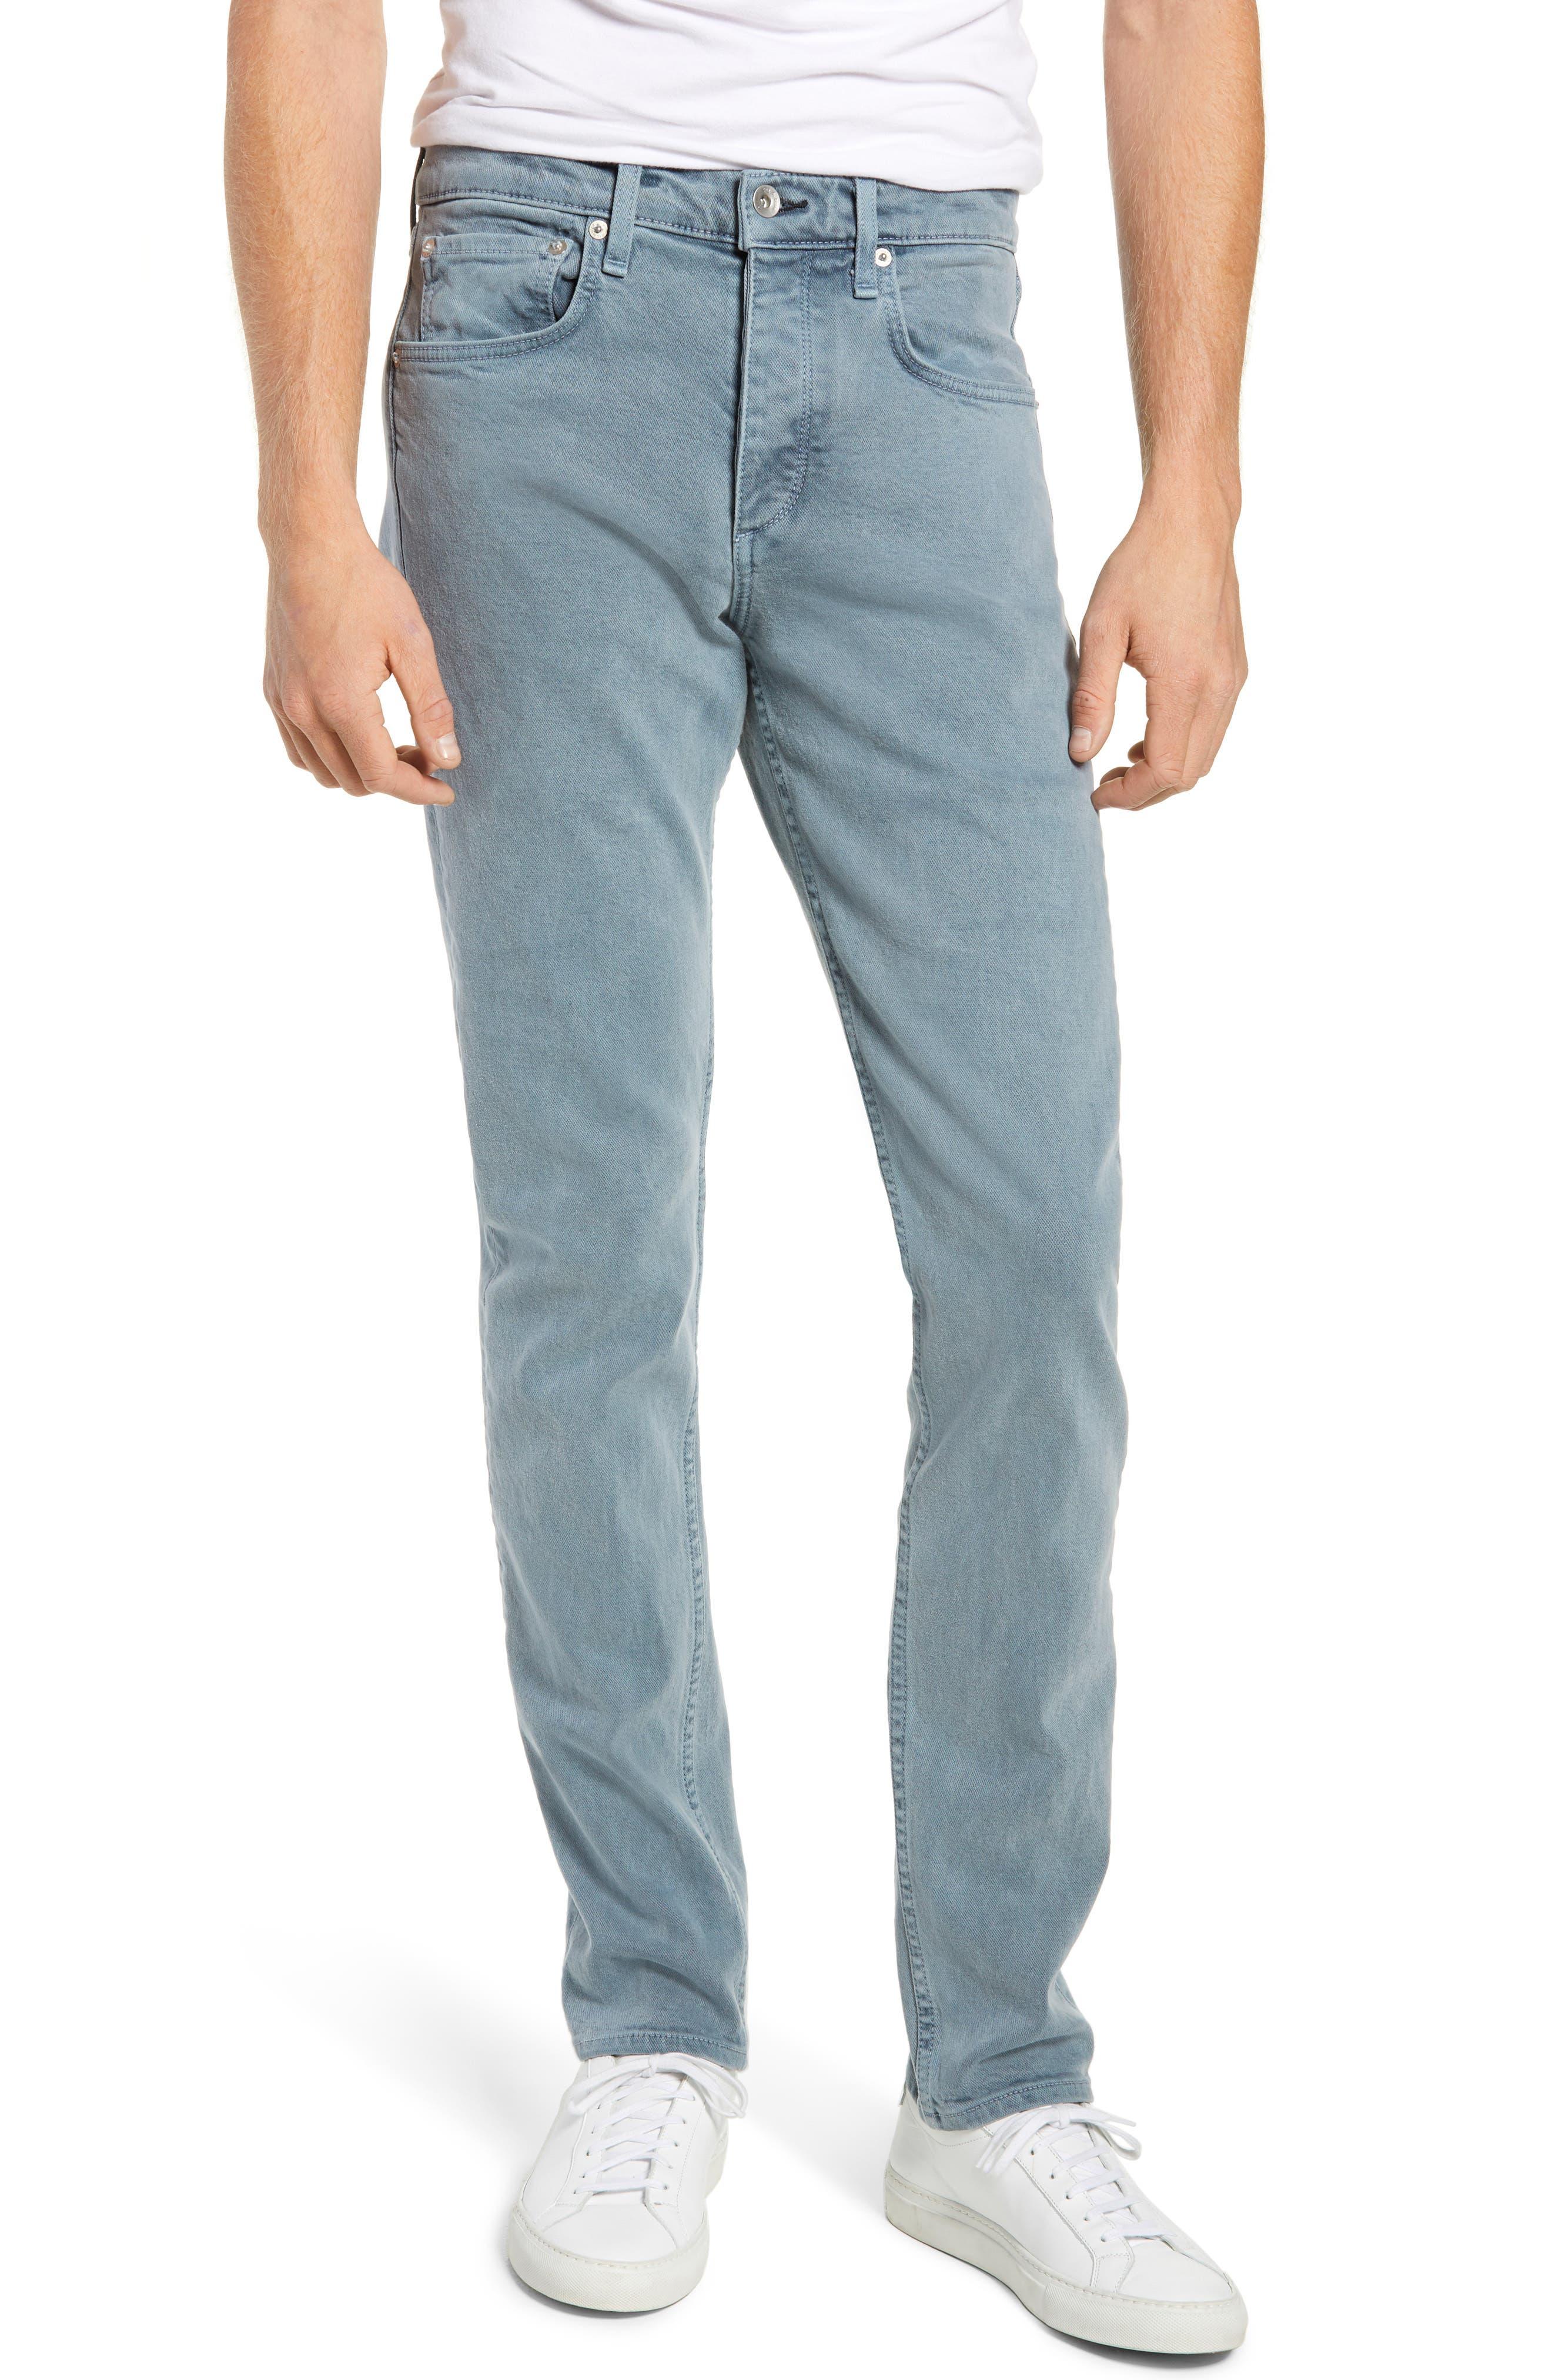 RAG & BONE Fit 2 Slim Fit Jeans, Main, color, SAUSALITO